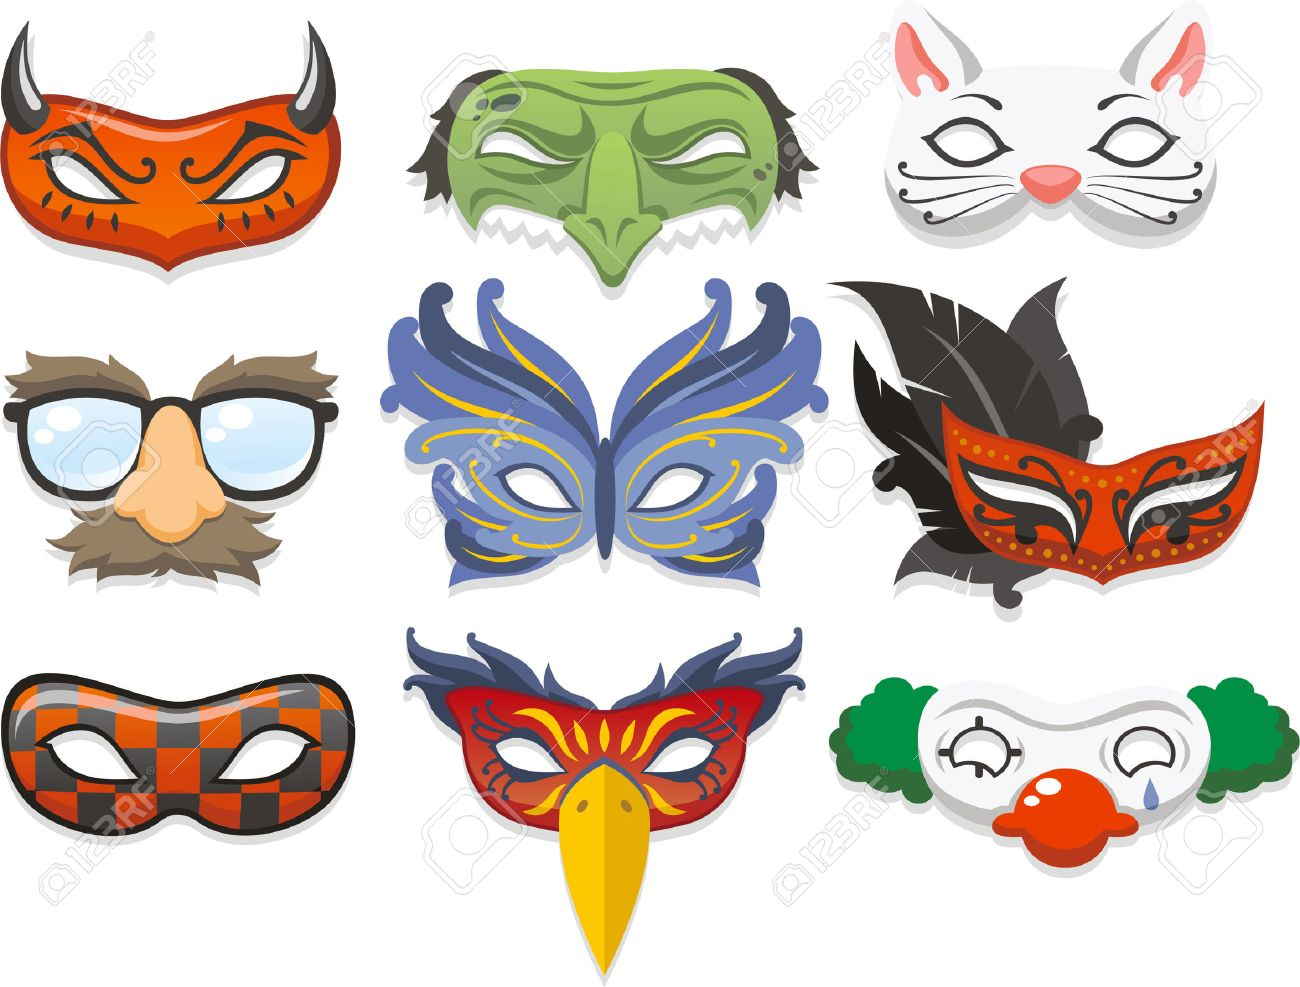 halloween costume dessin anim illustration masque ic nes clip art rh fr 123rf com